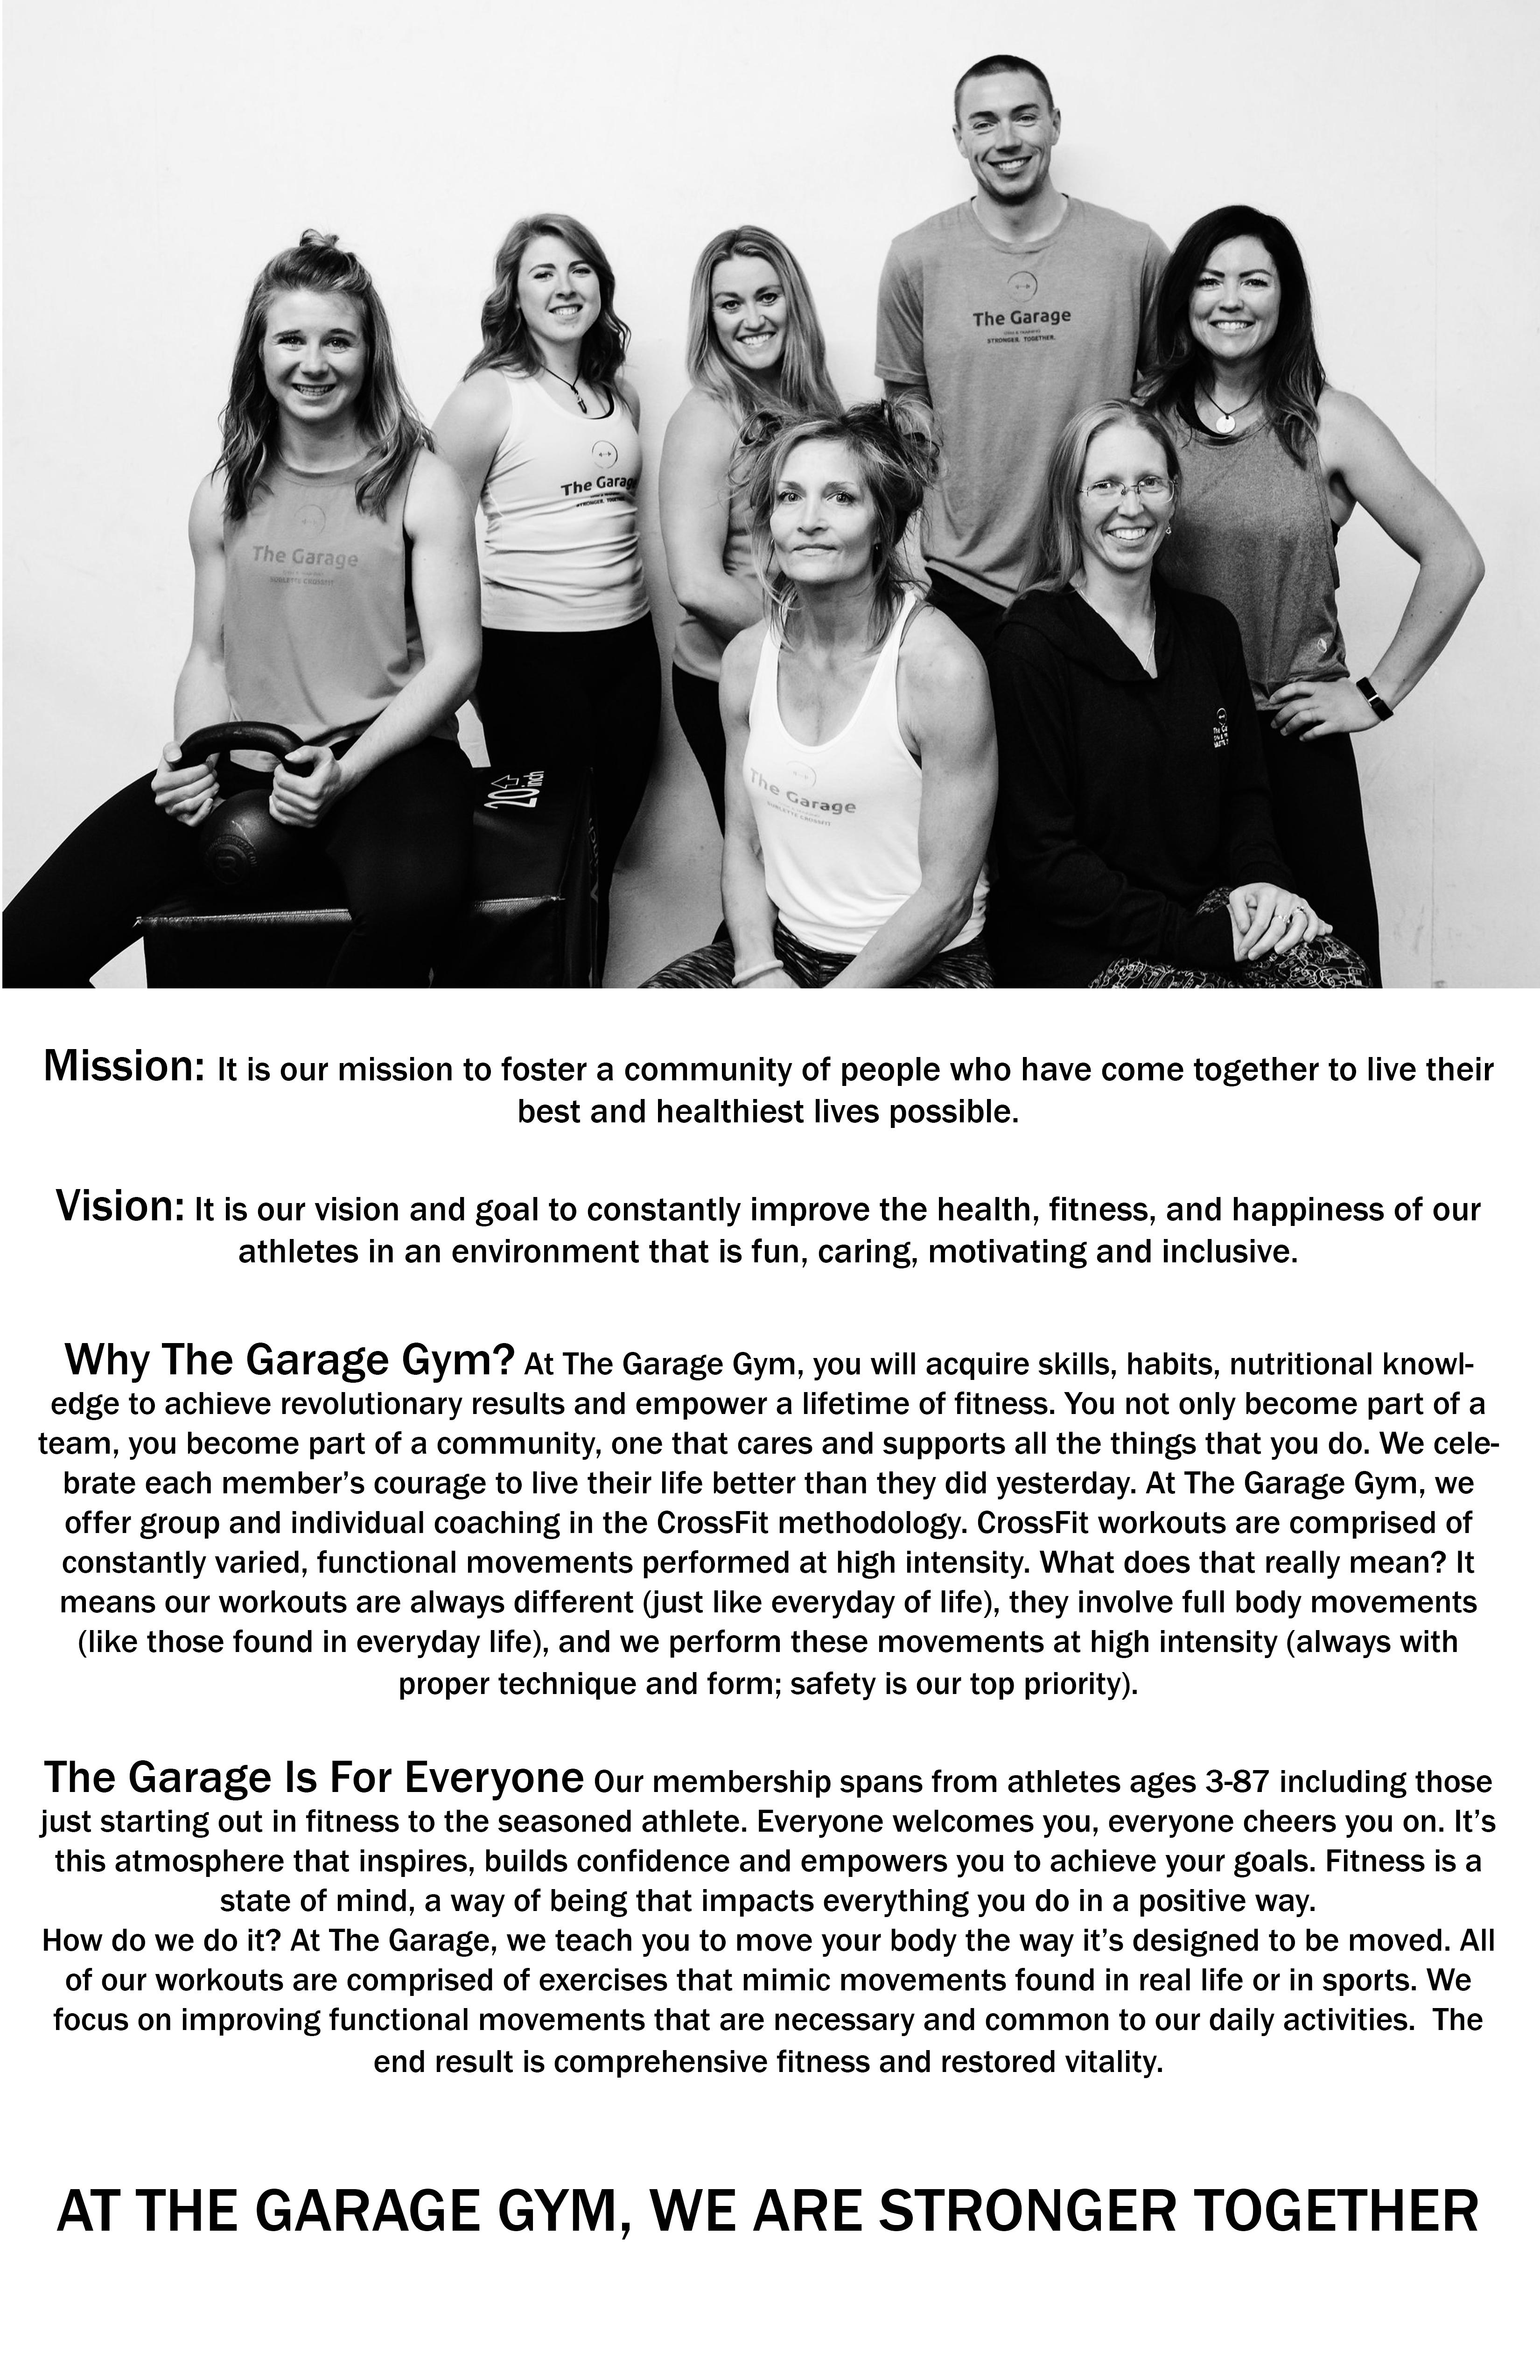 https://0201.nccdn.net/1_2/000/000/163/974/11x17MissionStatement-Poster.jpg